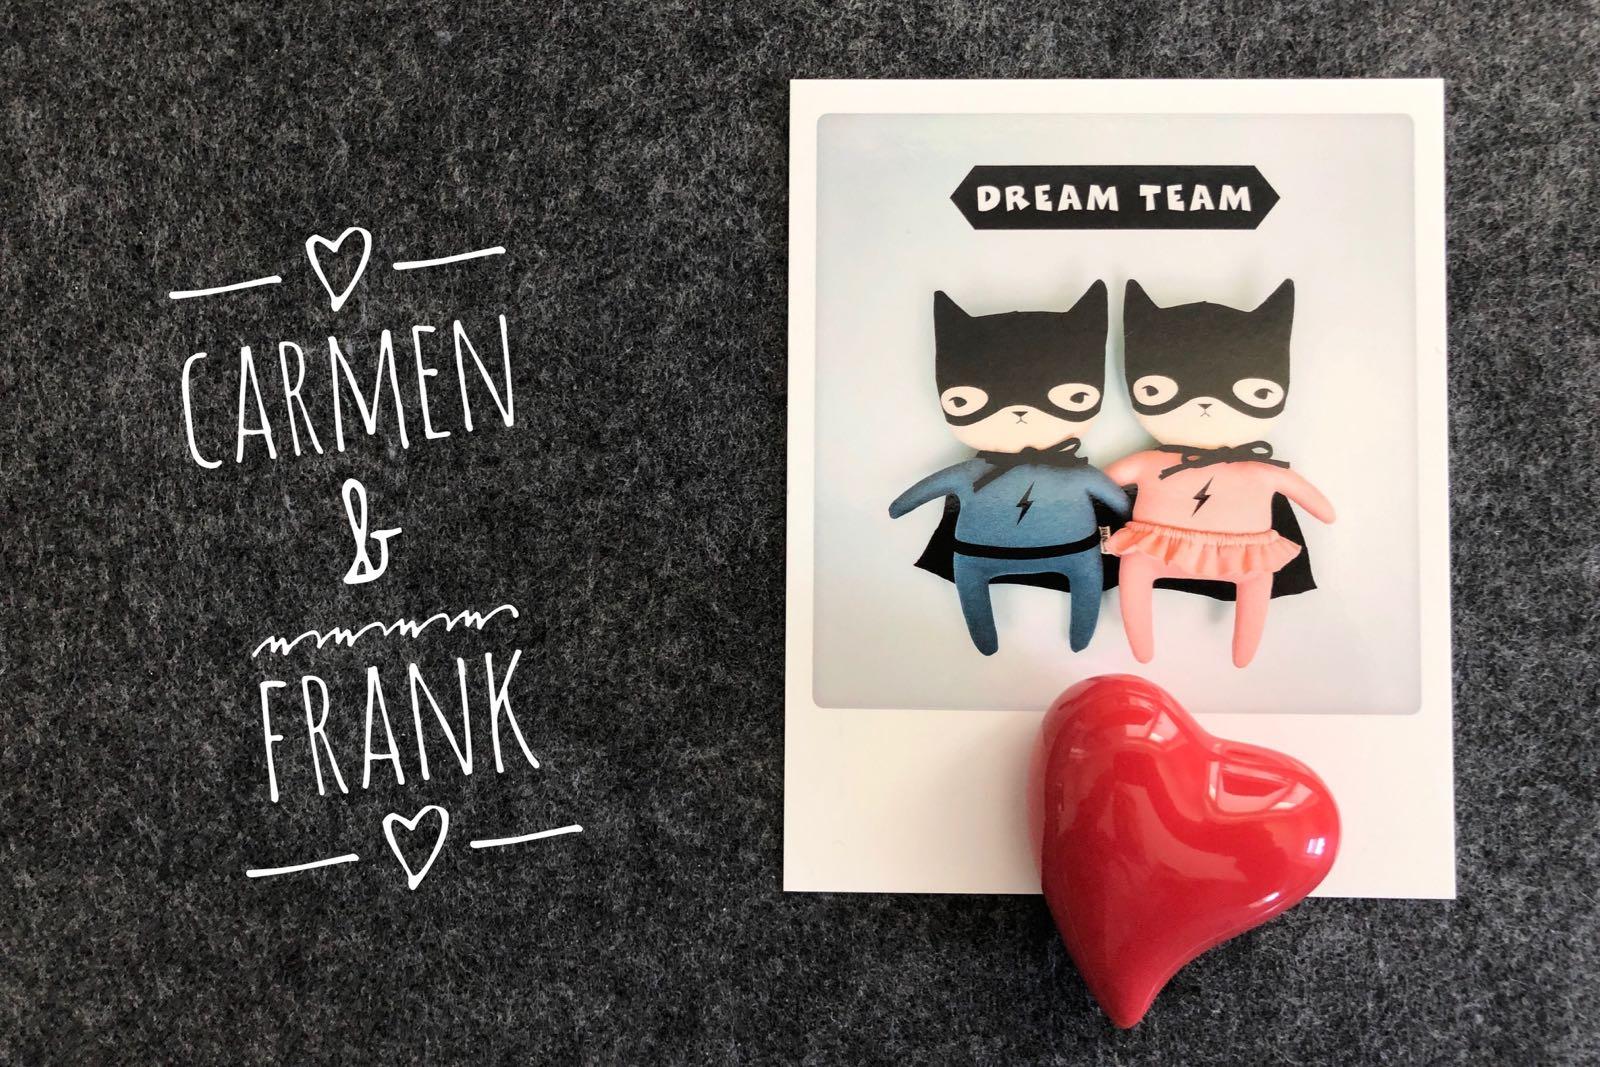 Carmen und Frank